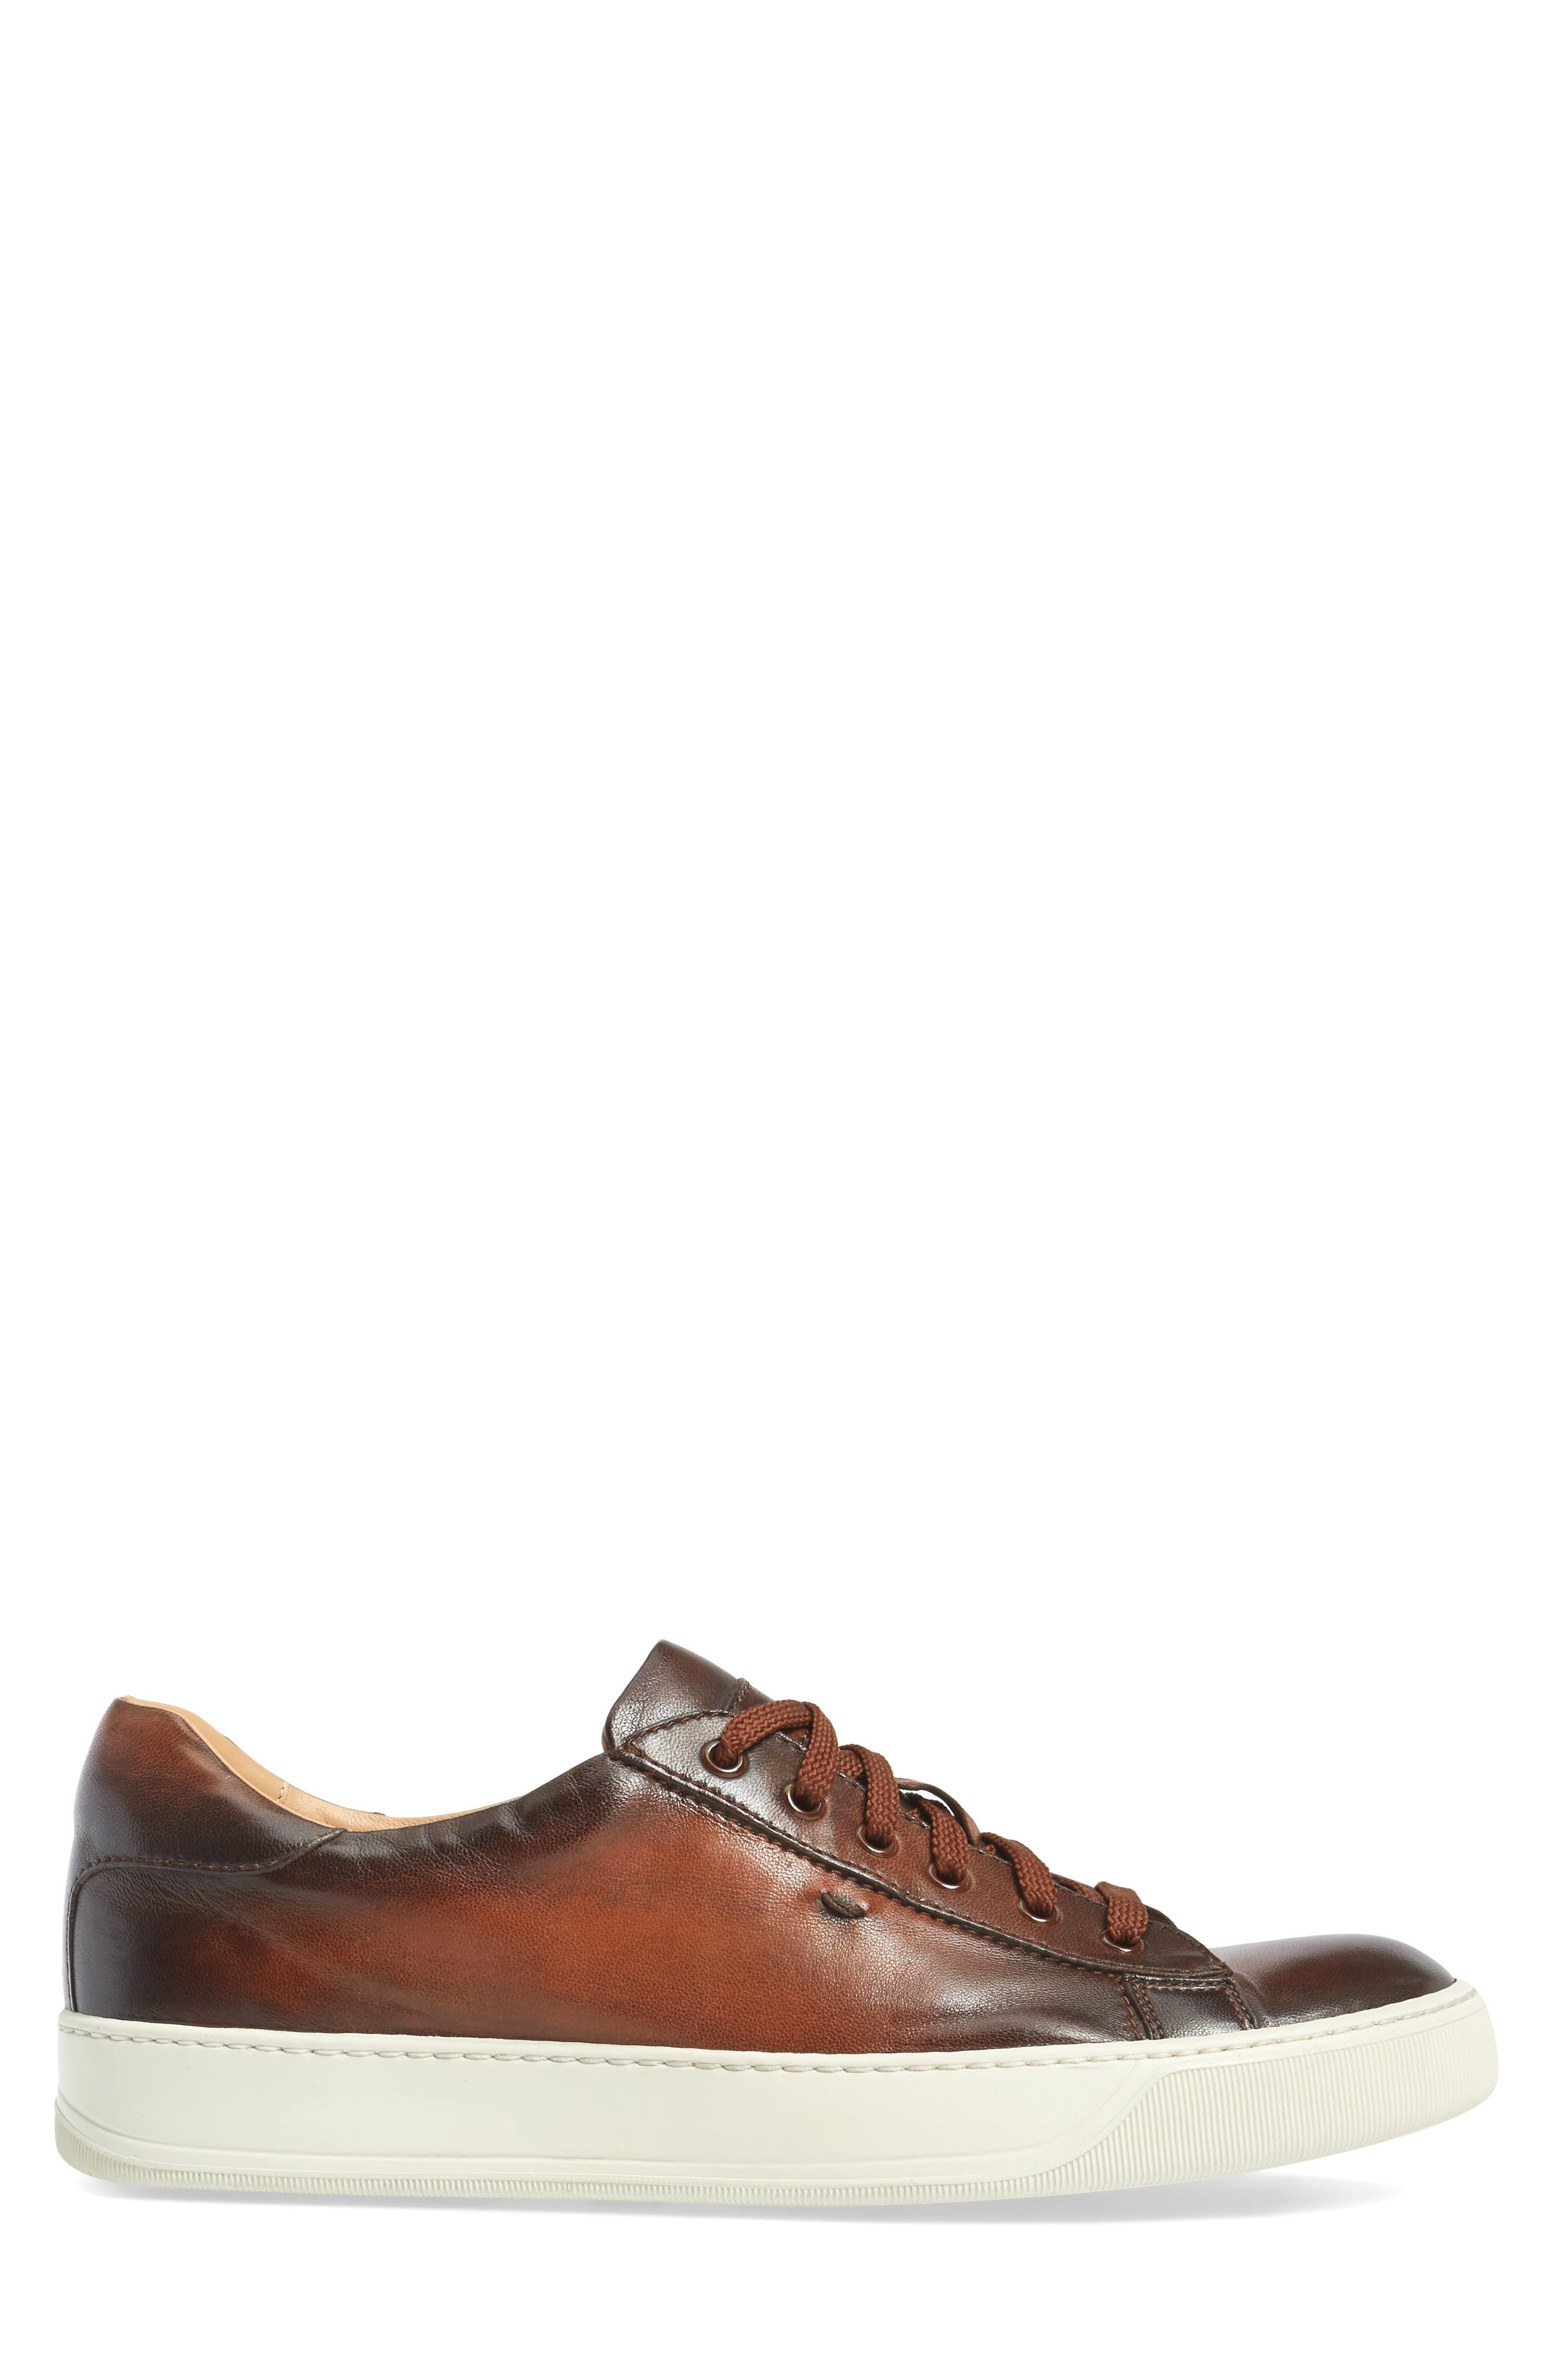 'Apache' Lace-Up Sneaker,                             Alternate thumbnail 15, color,